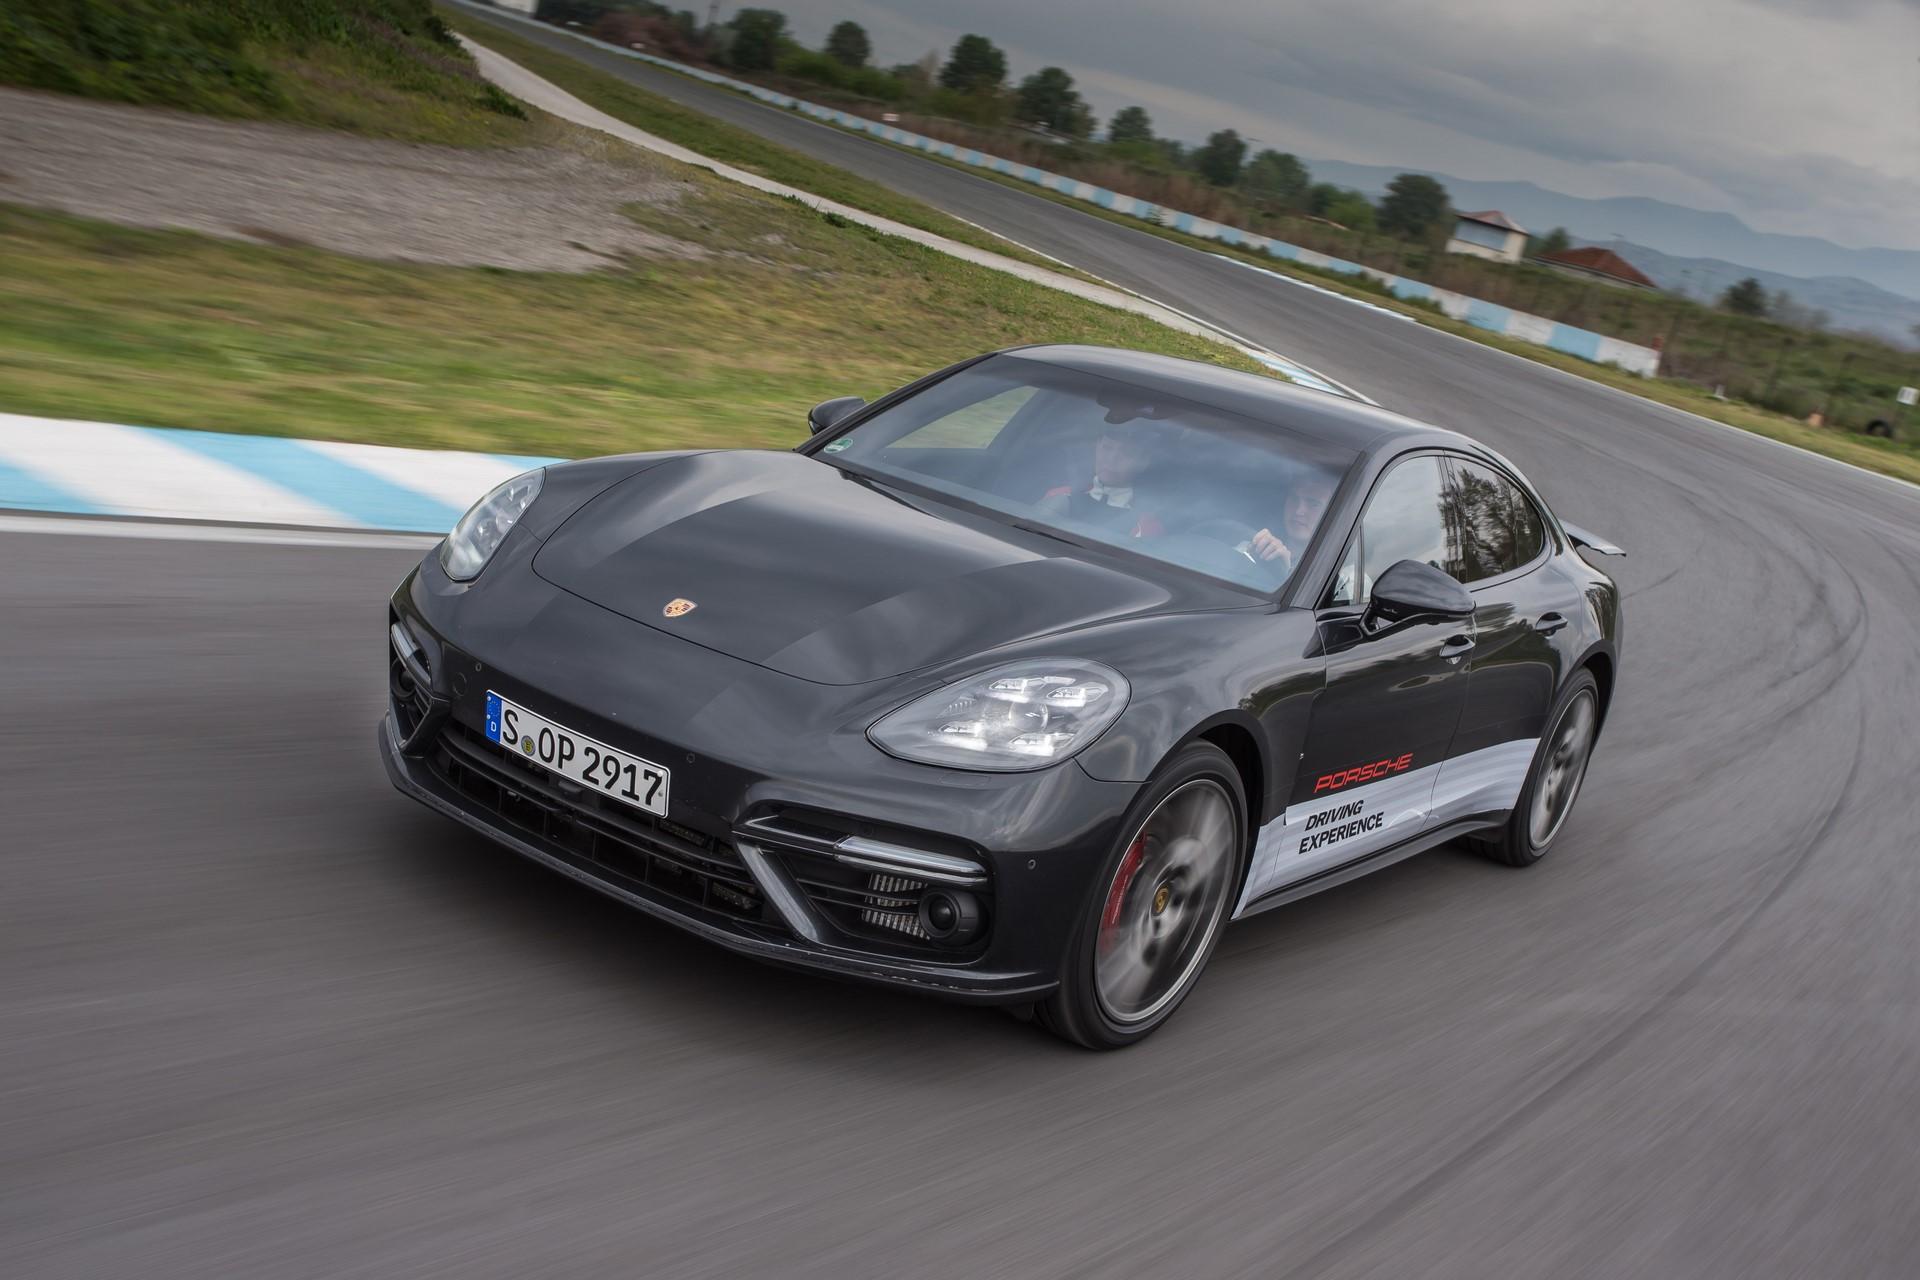 Porsche Driving Experience 2017 Serres (41)